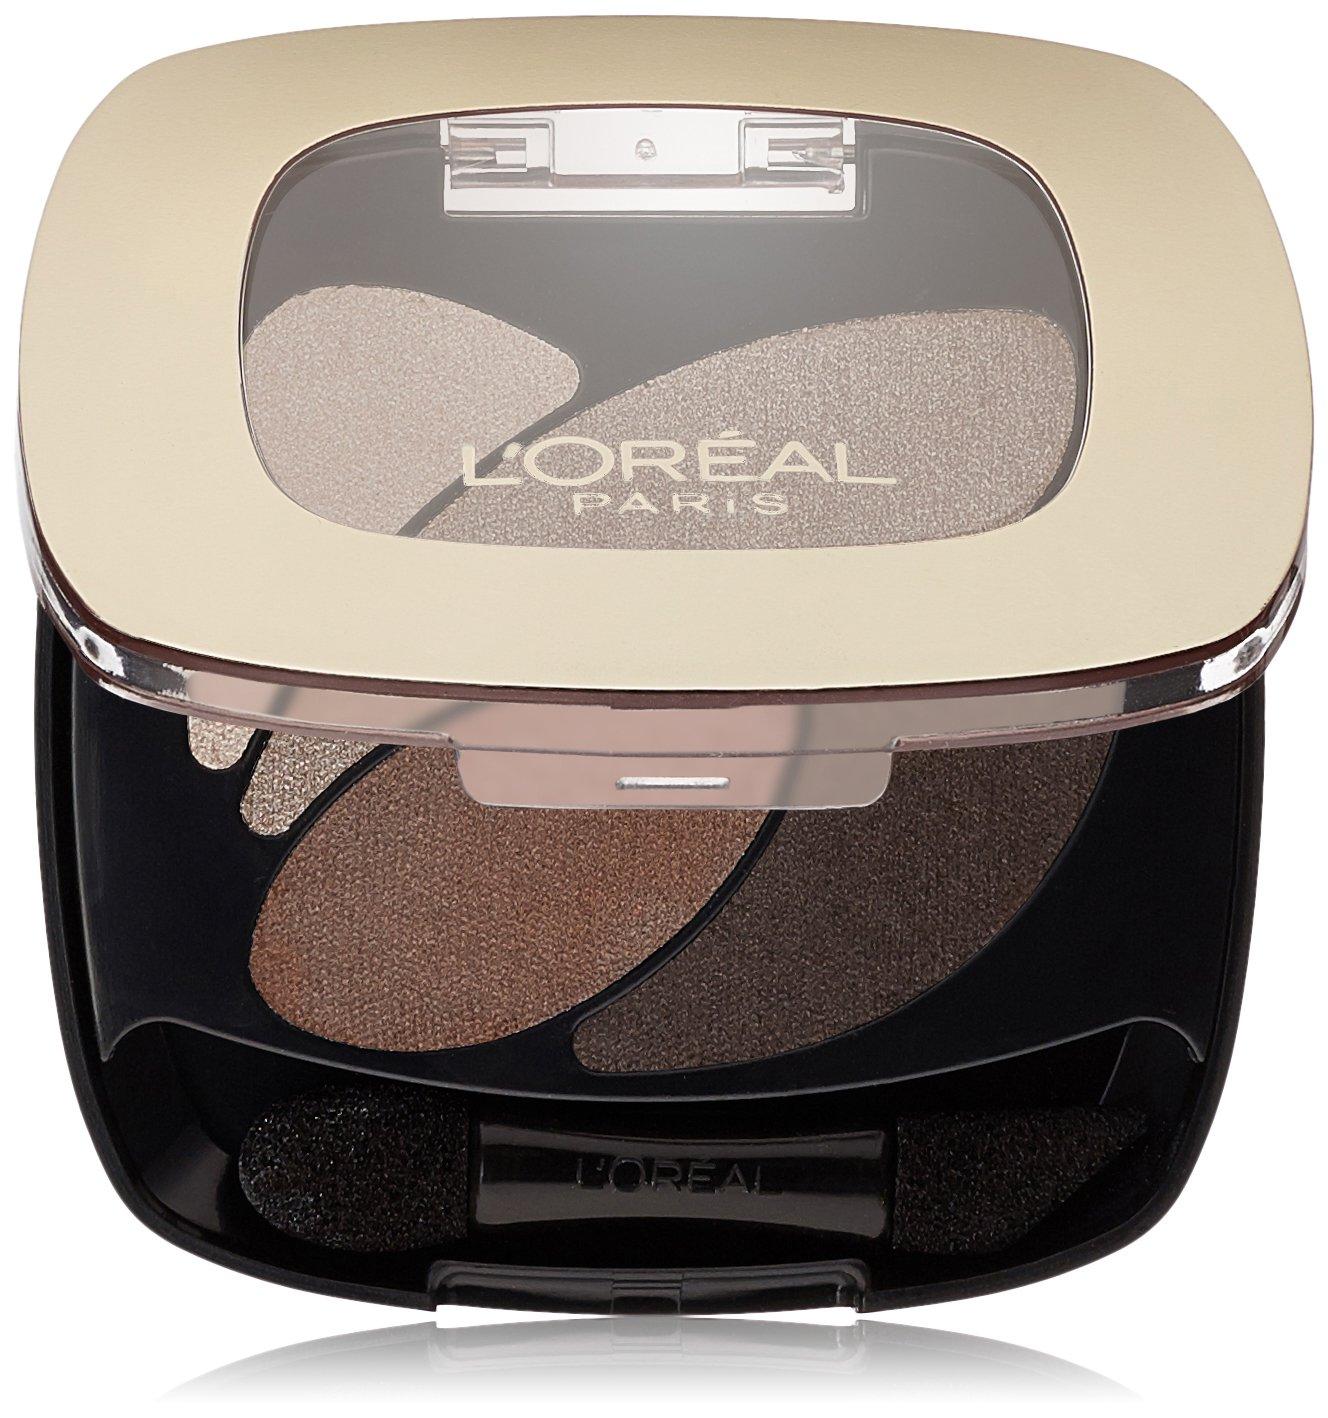 L'Oréal Paris Colour Riche Dual Effects Eye Shadow, Absolute Taupe, 0.12 oz.